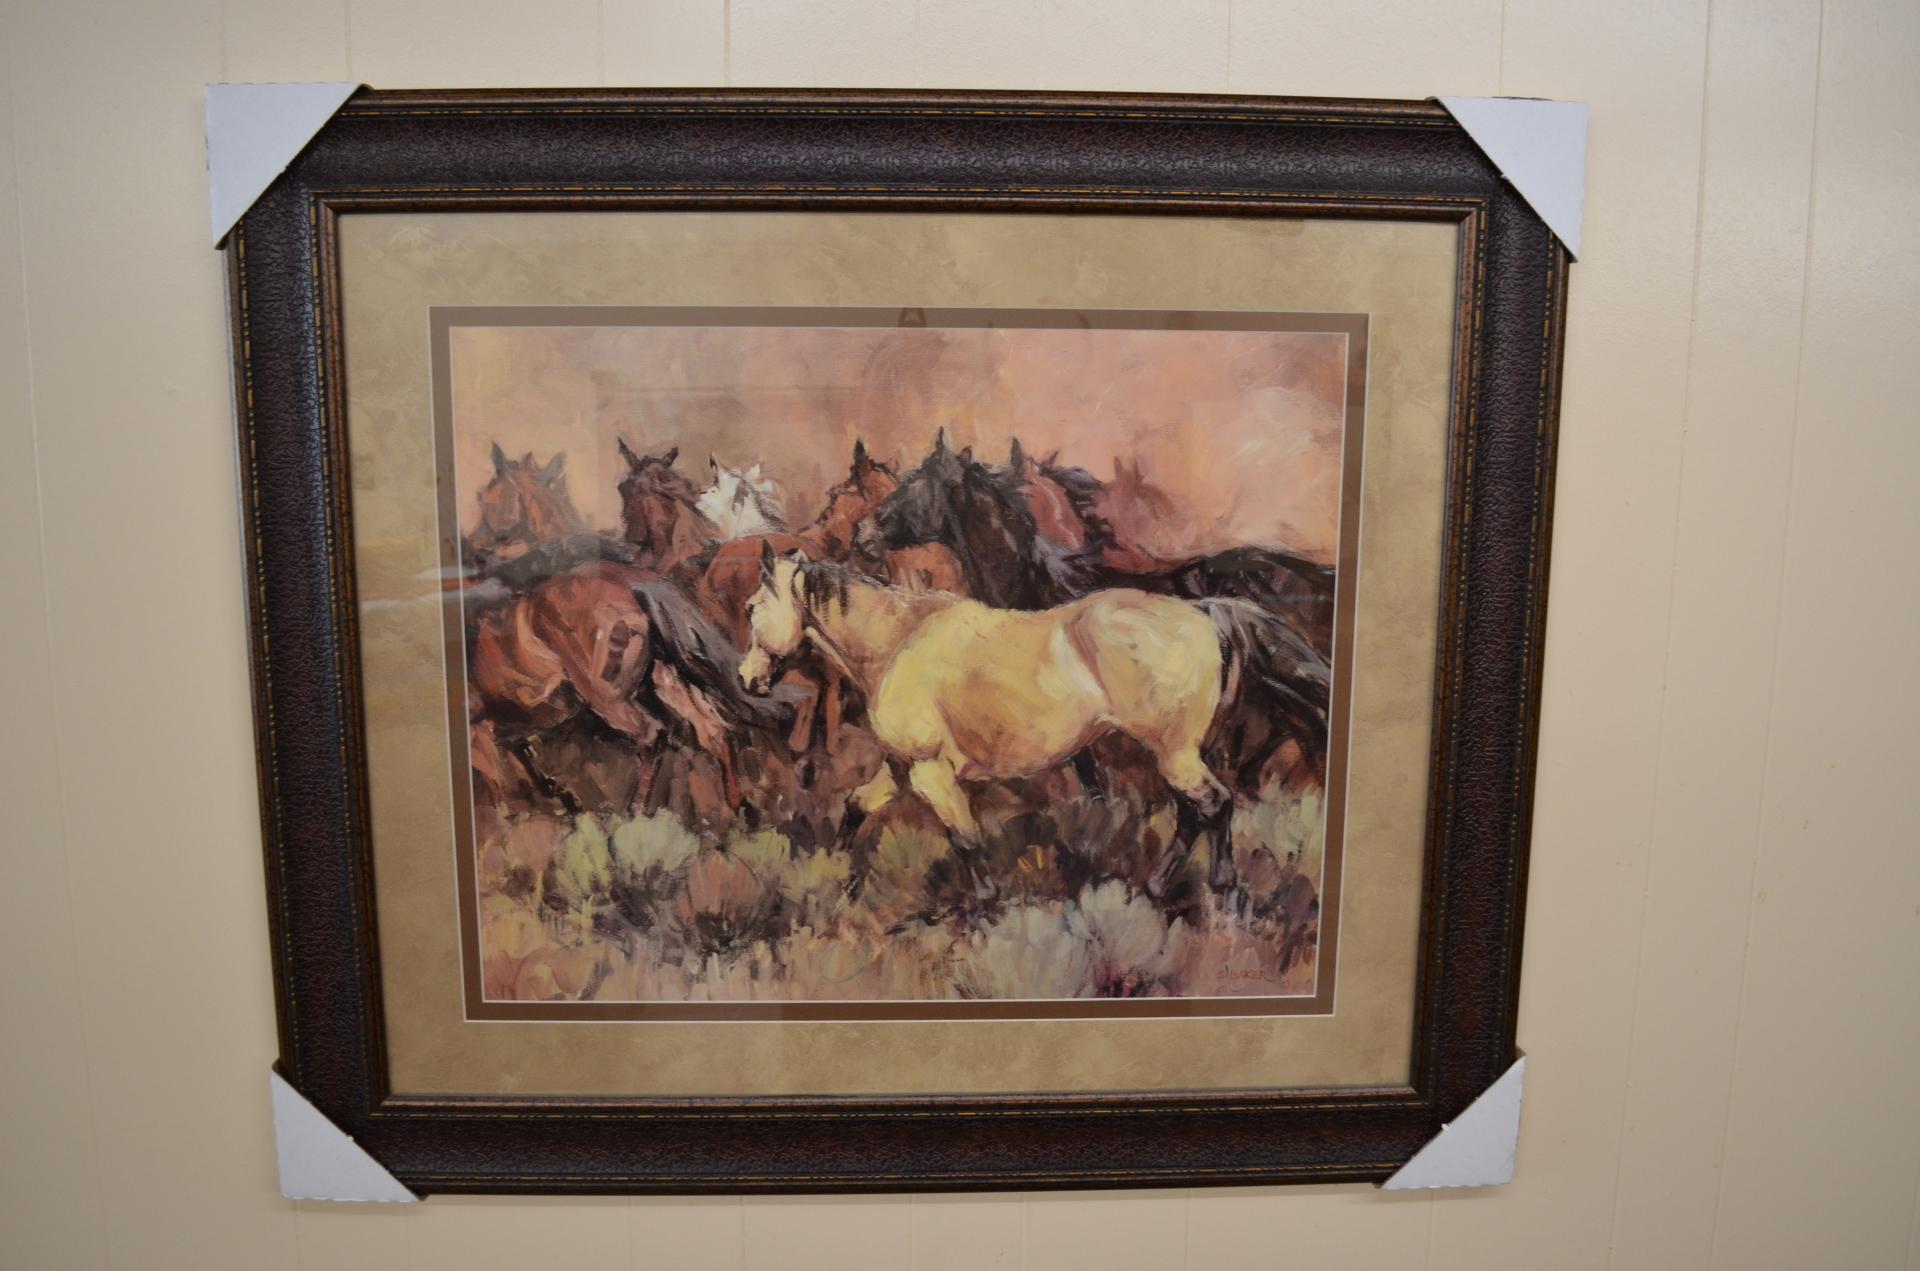 Framed Oil Painting, group of horses-$163.00